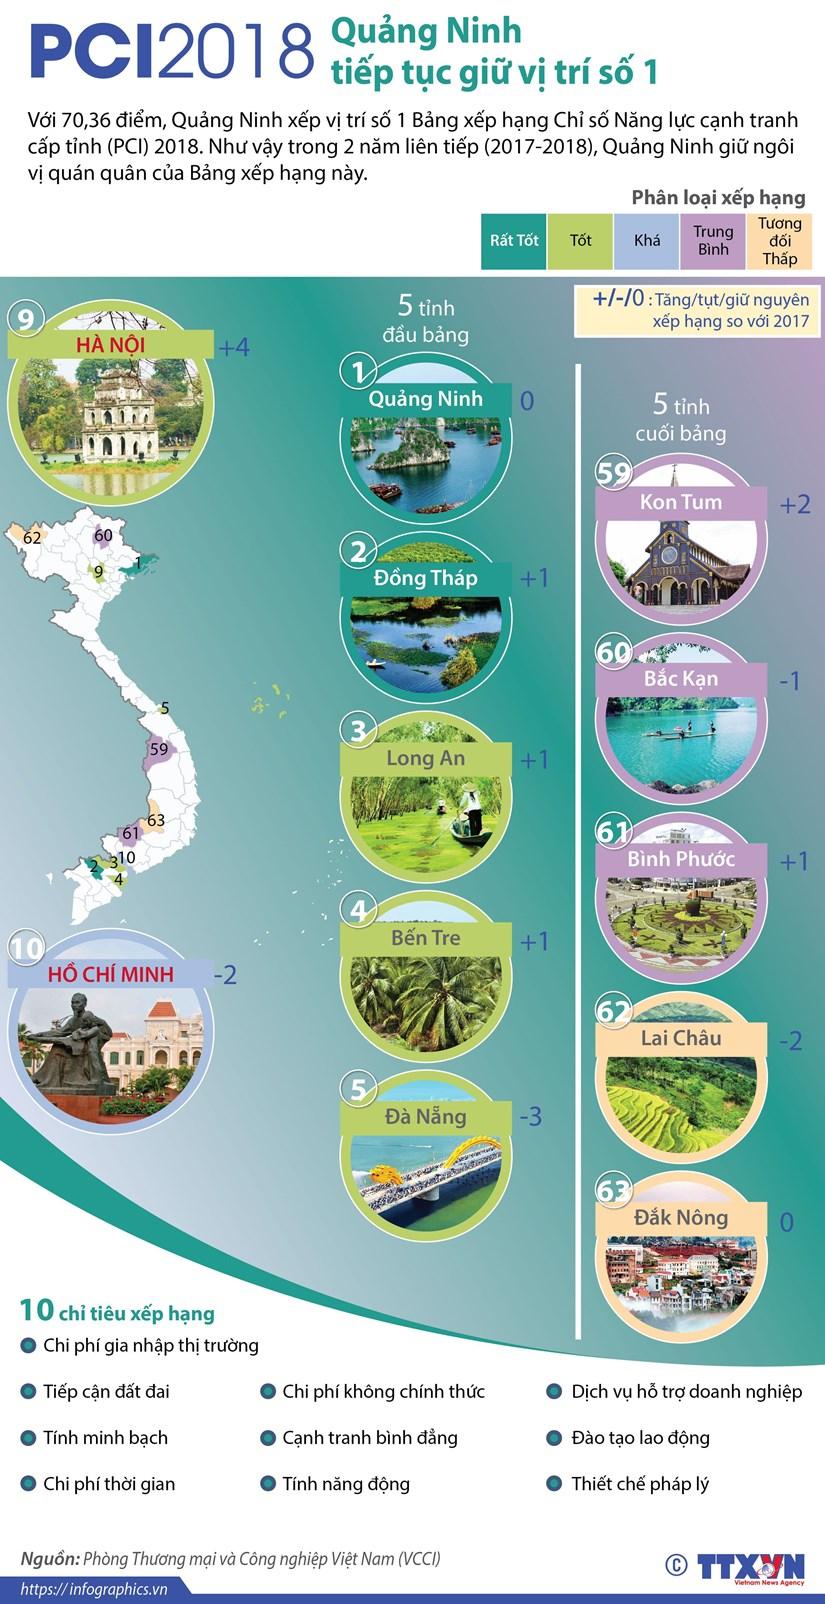 PCI 2018: Quang Ninh tiep tuc giu vi tri so 1 trong bang xep hang hinh anh 1